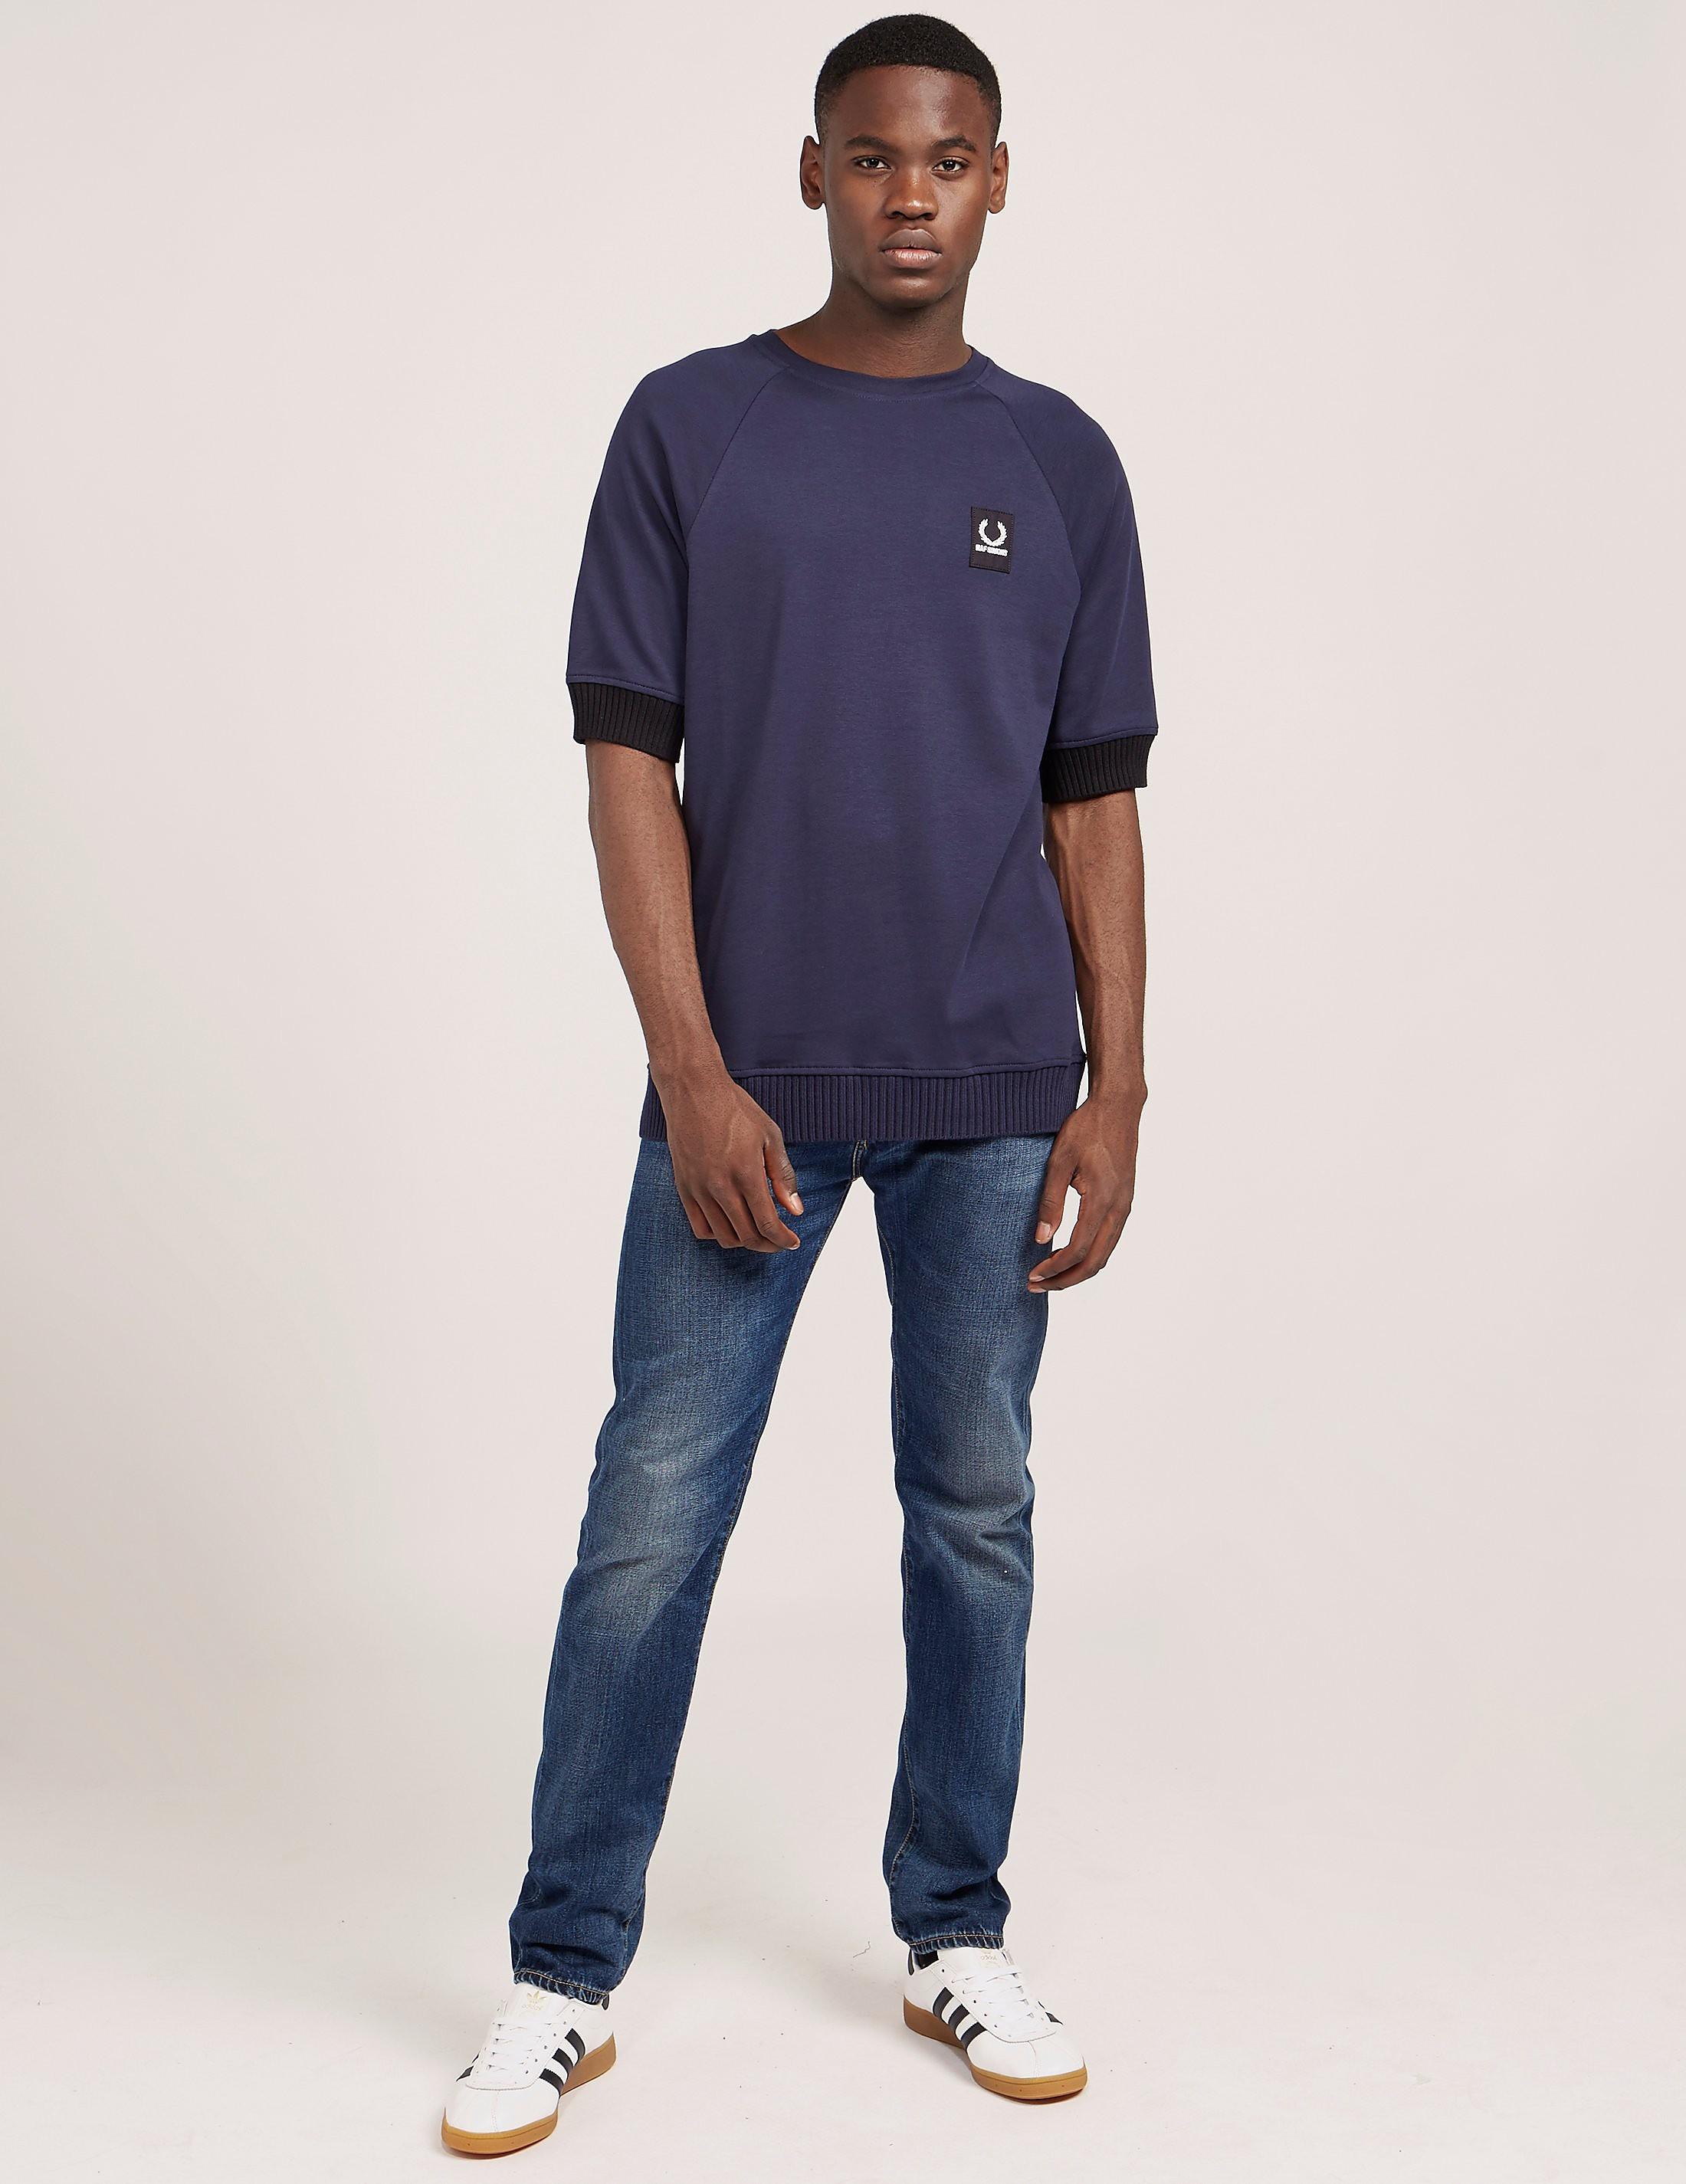 Fred Perry Raf Simons Raglan Short Sleeve T-Shirt